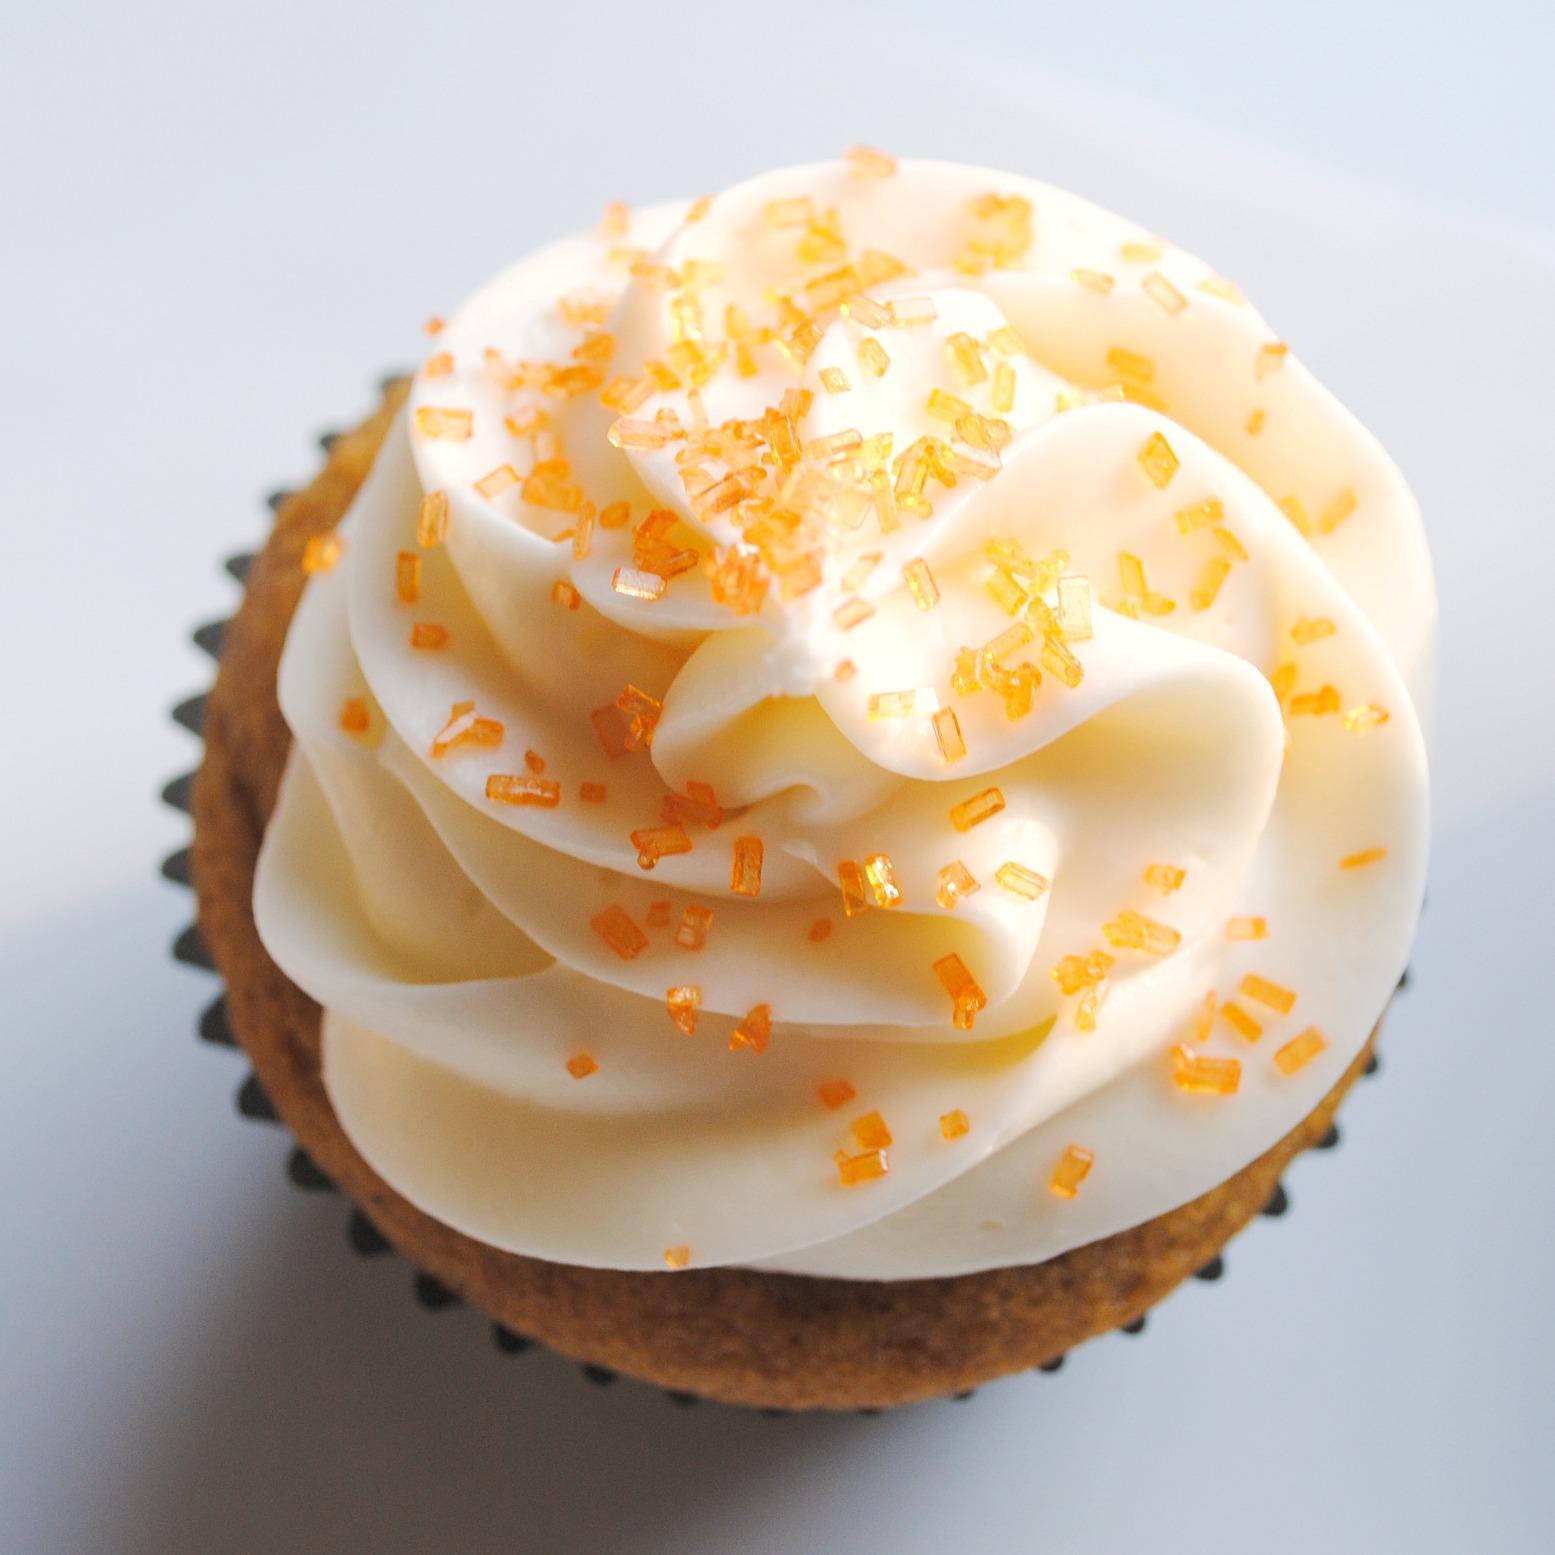 Recipe For Pumpkin Cake With Caramel Sauce